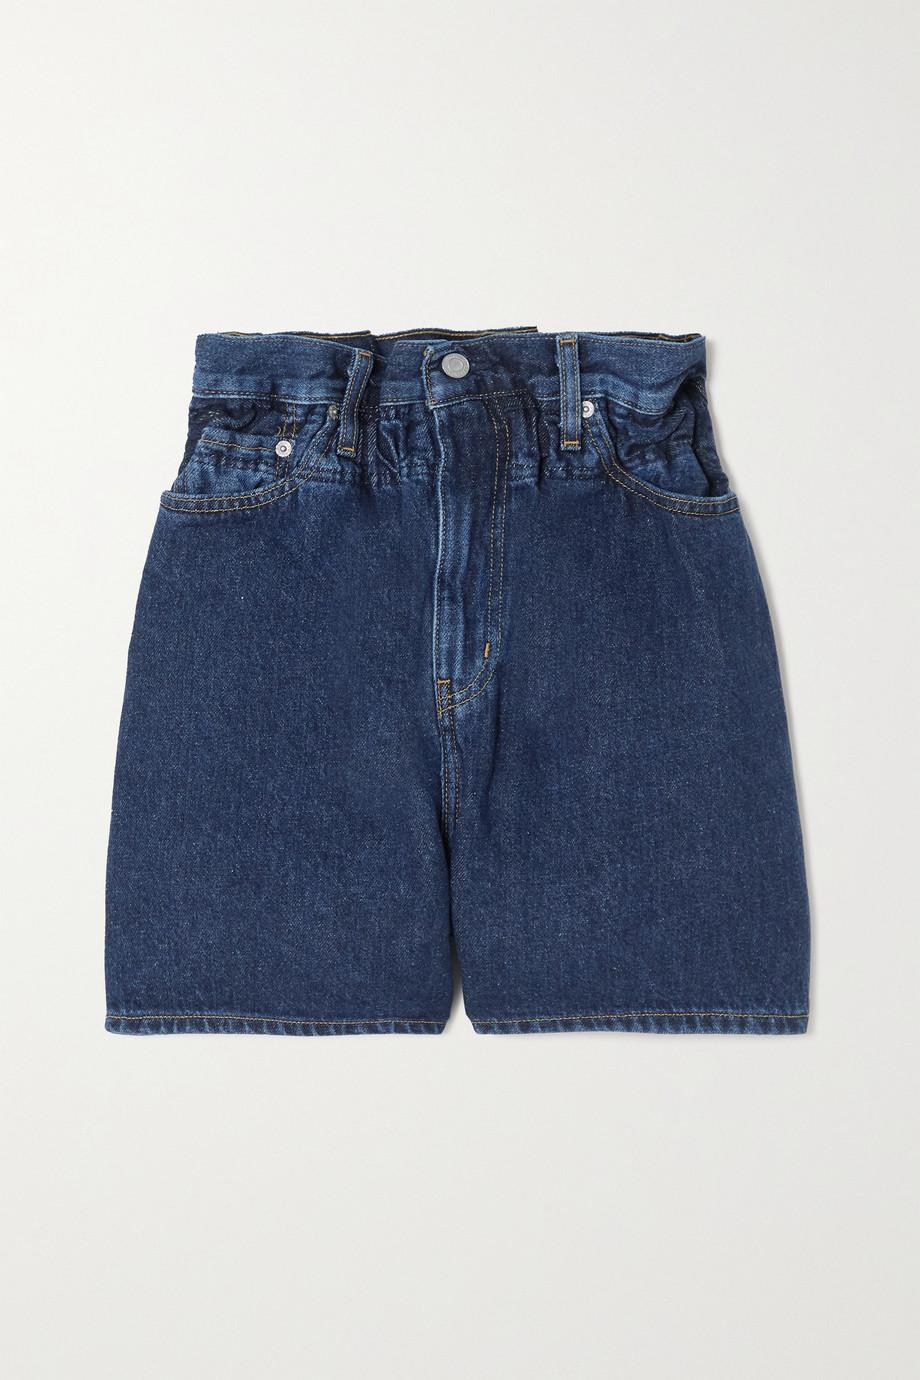 GANNI + Levi's denim shorts